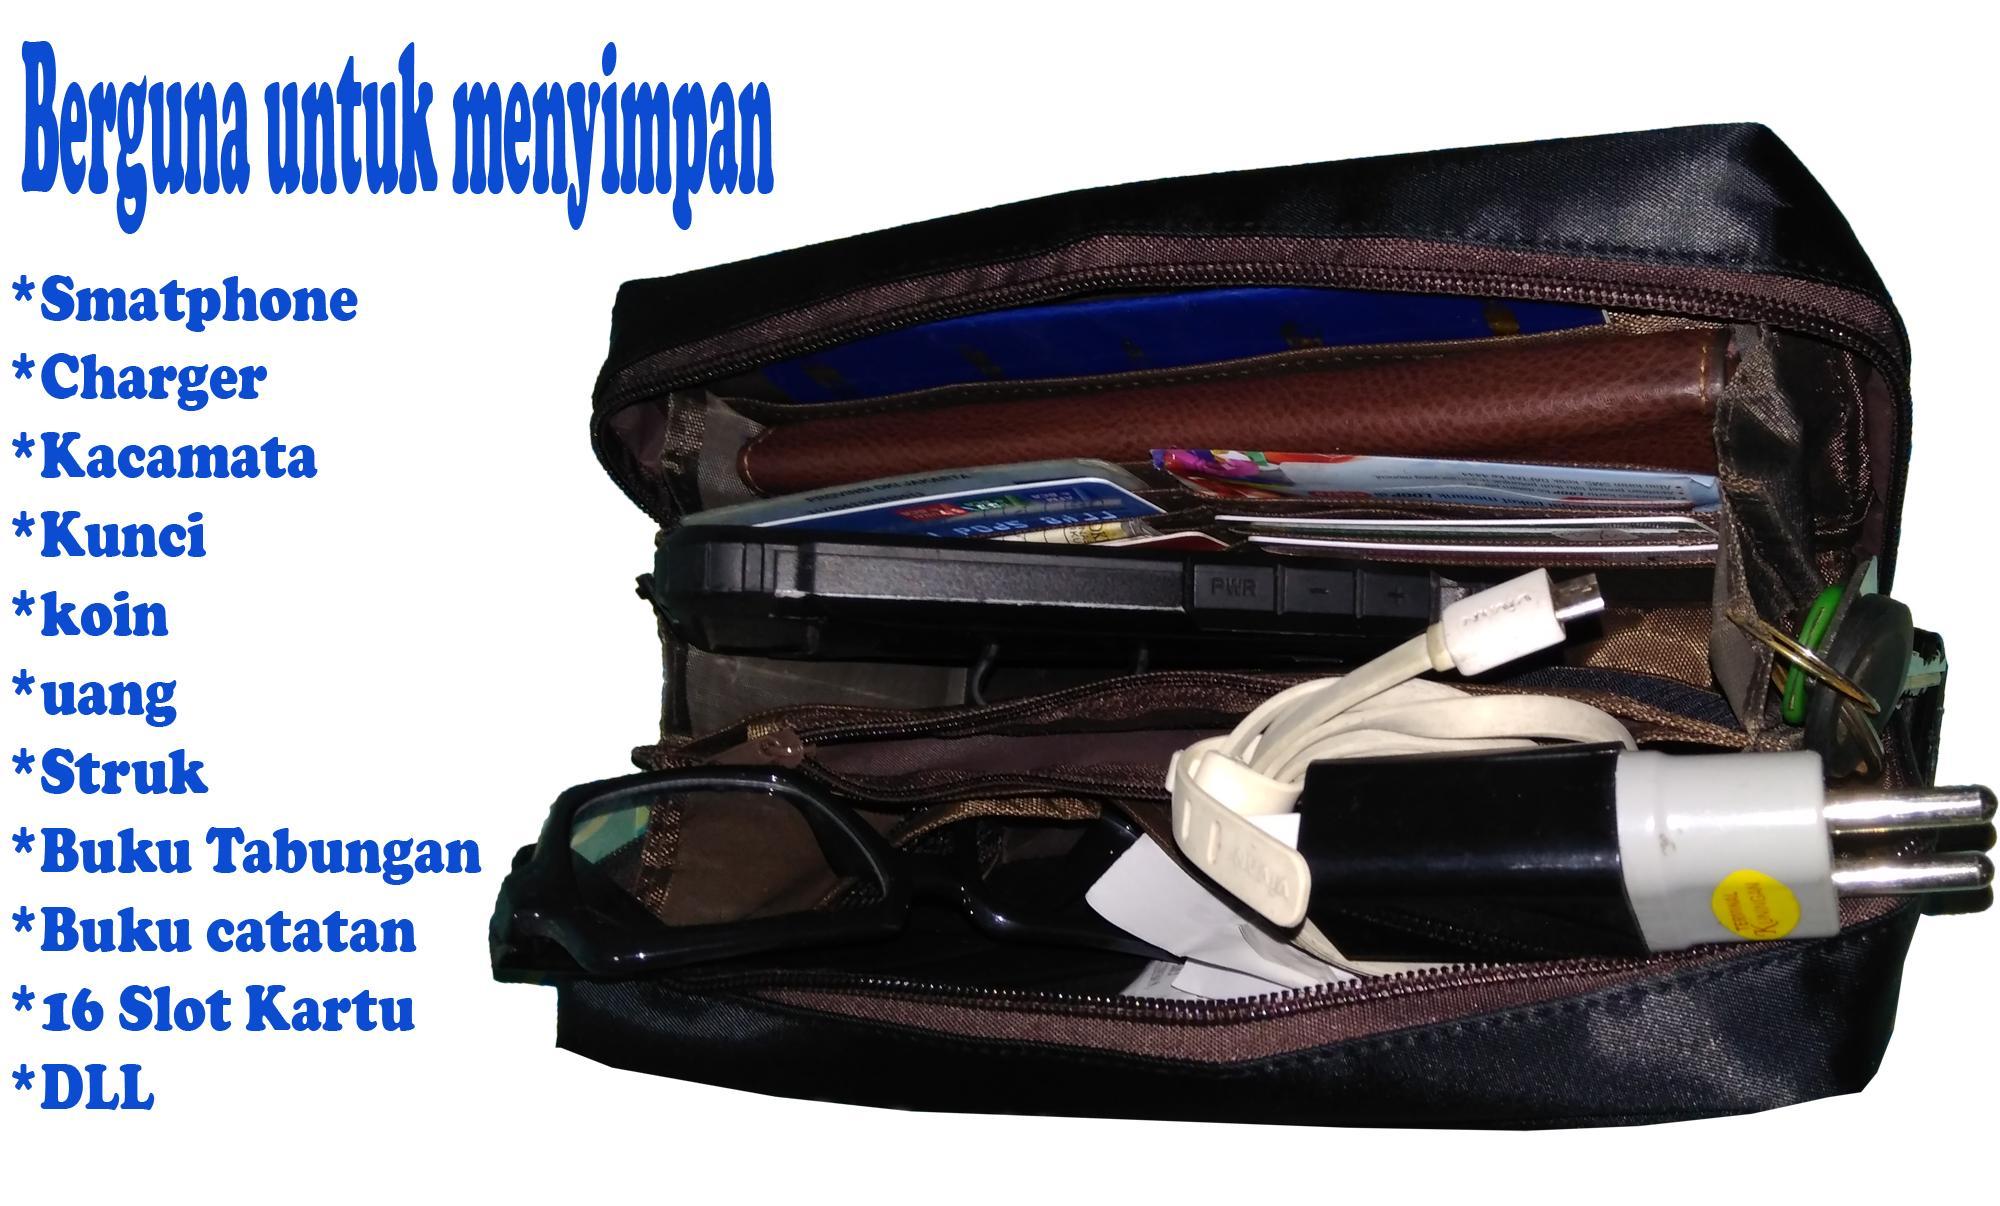 Handphone  struk  Charger  acessoris  16 Kartu  uang  koin  Lipstick   kalung  Dll Banyak skat ruang a lebih rapih dan tertata isi a 6 pilihan  warna  Hitam ... 2d8b9a5244